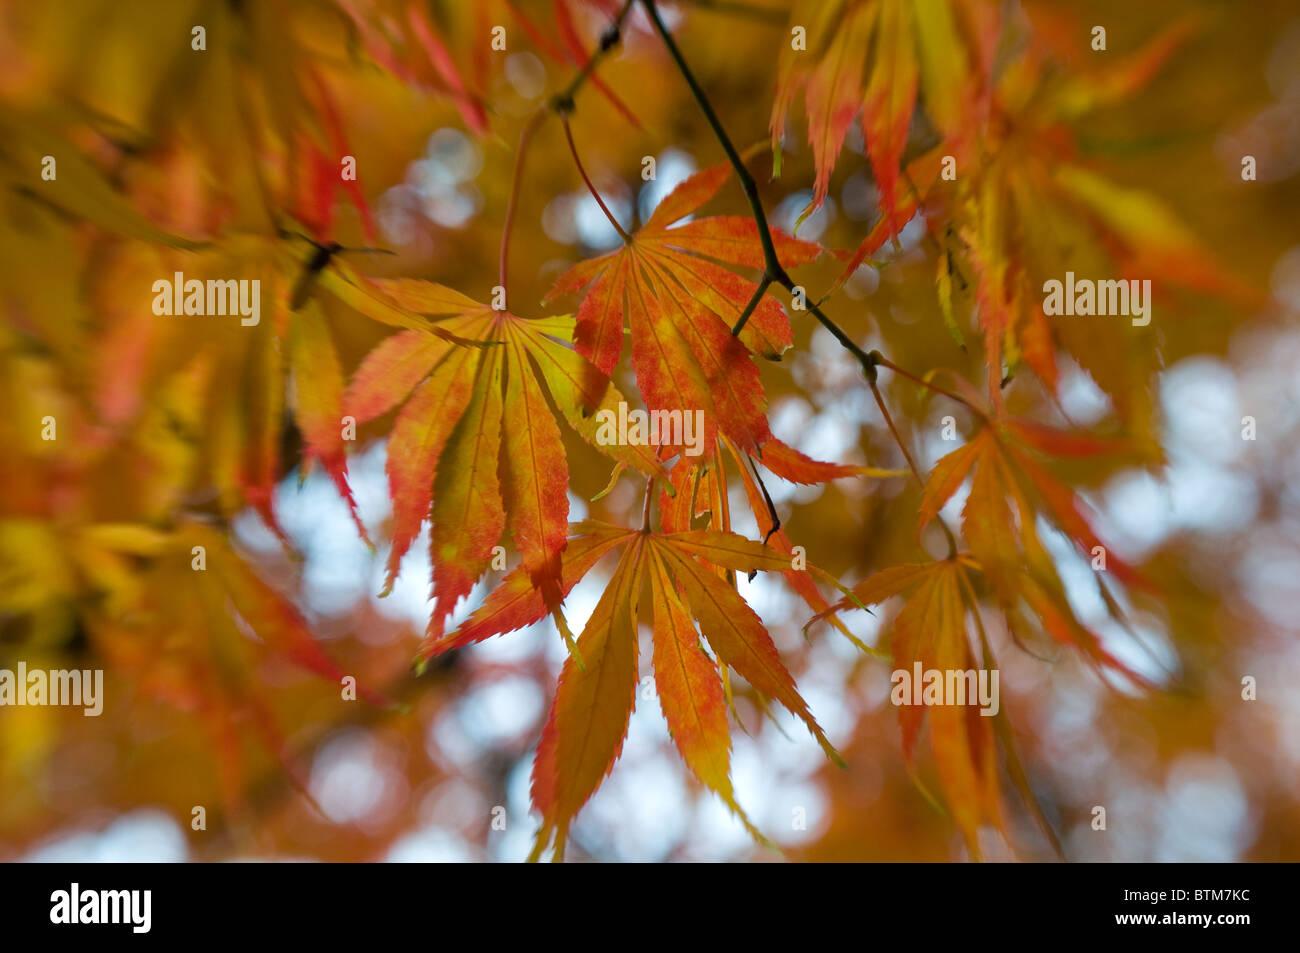 japanese maple acer palmatum orange stockfotos japanese. Black Bedroom Furniture Sets. Home Design Ideas